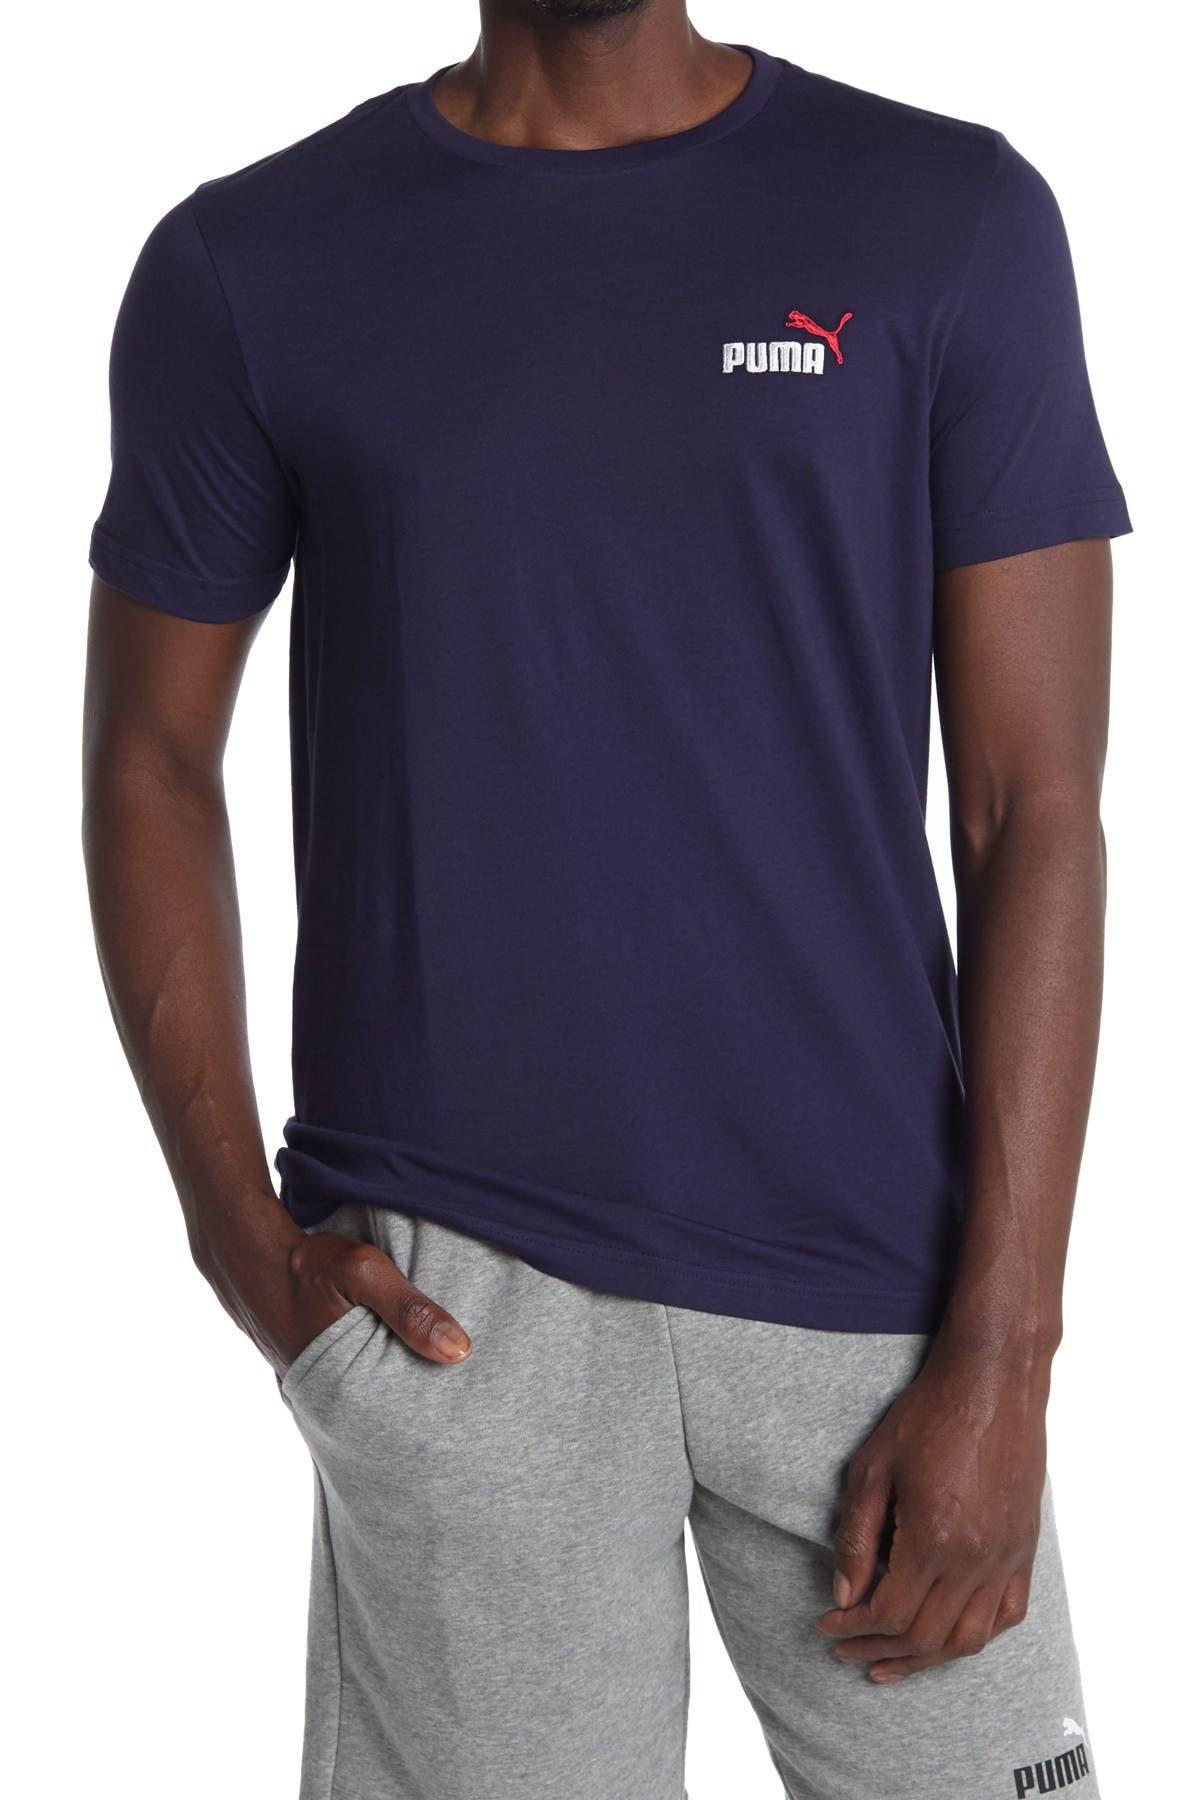 Image of PUMA Essential Embroidered Logo Tee